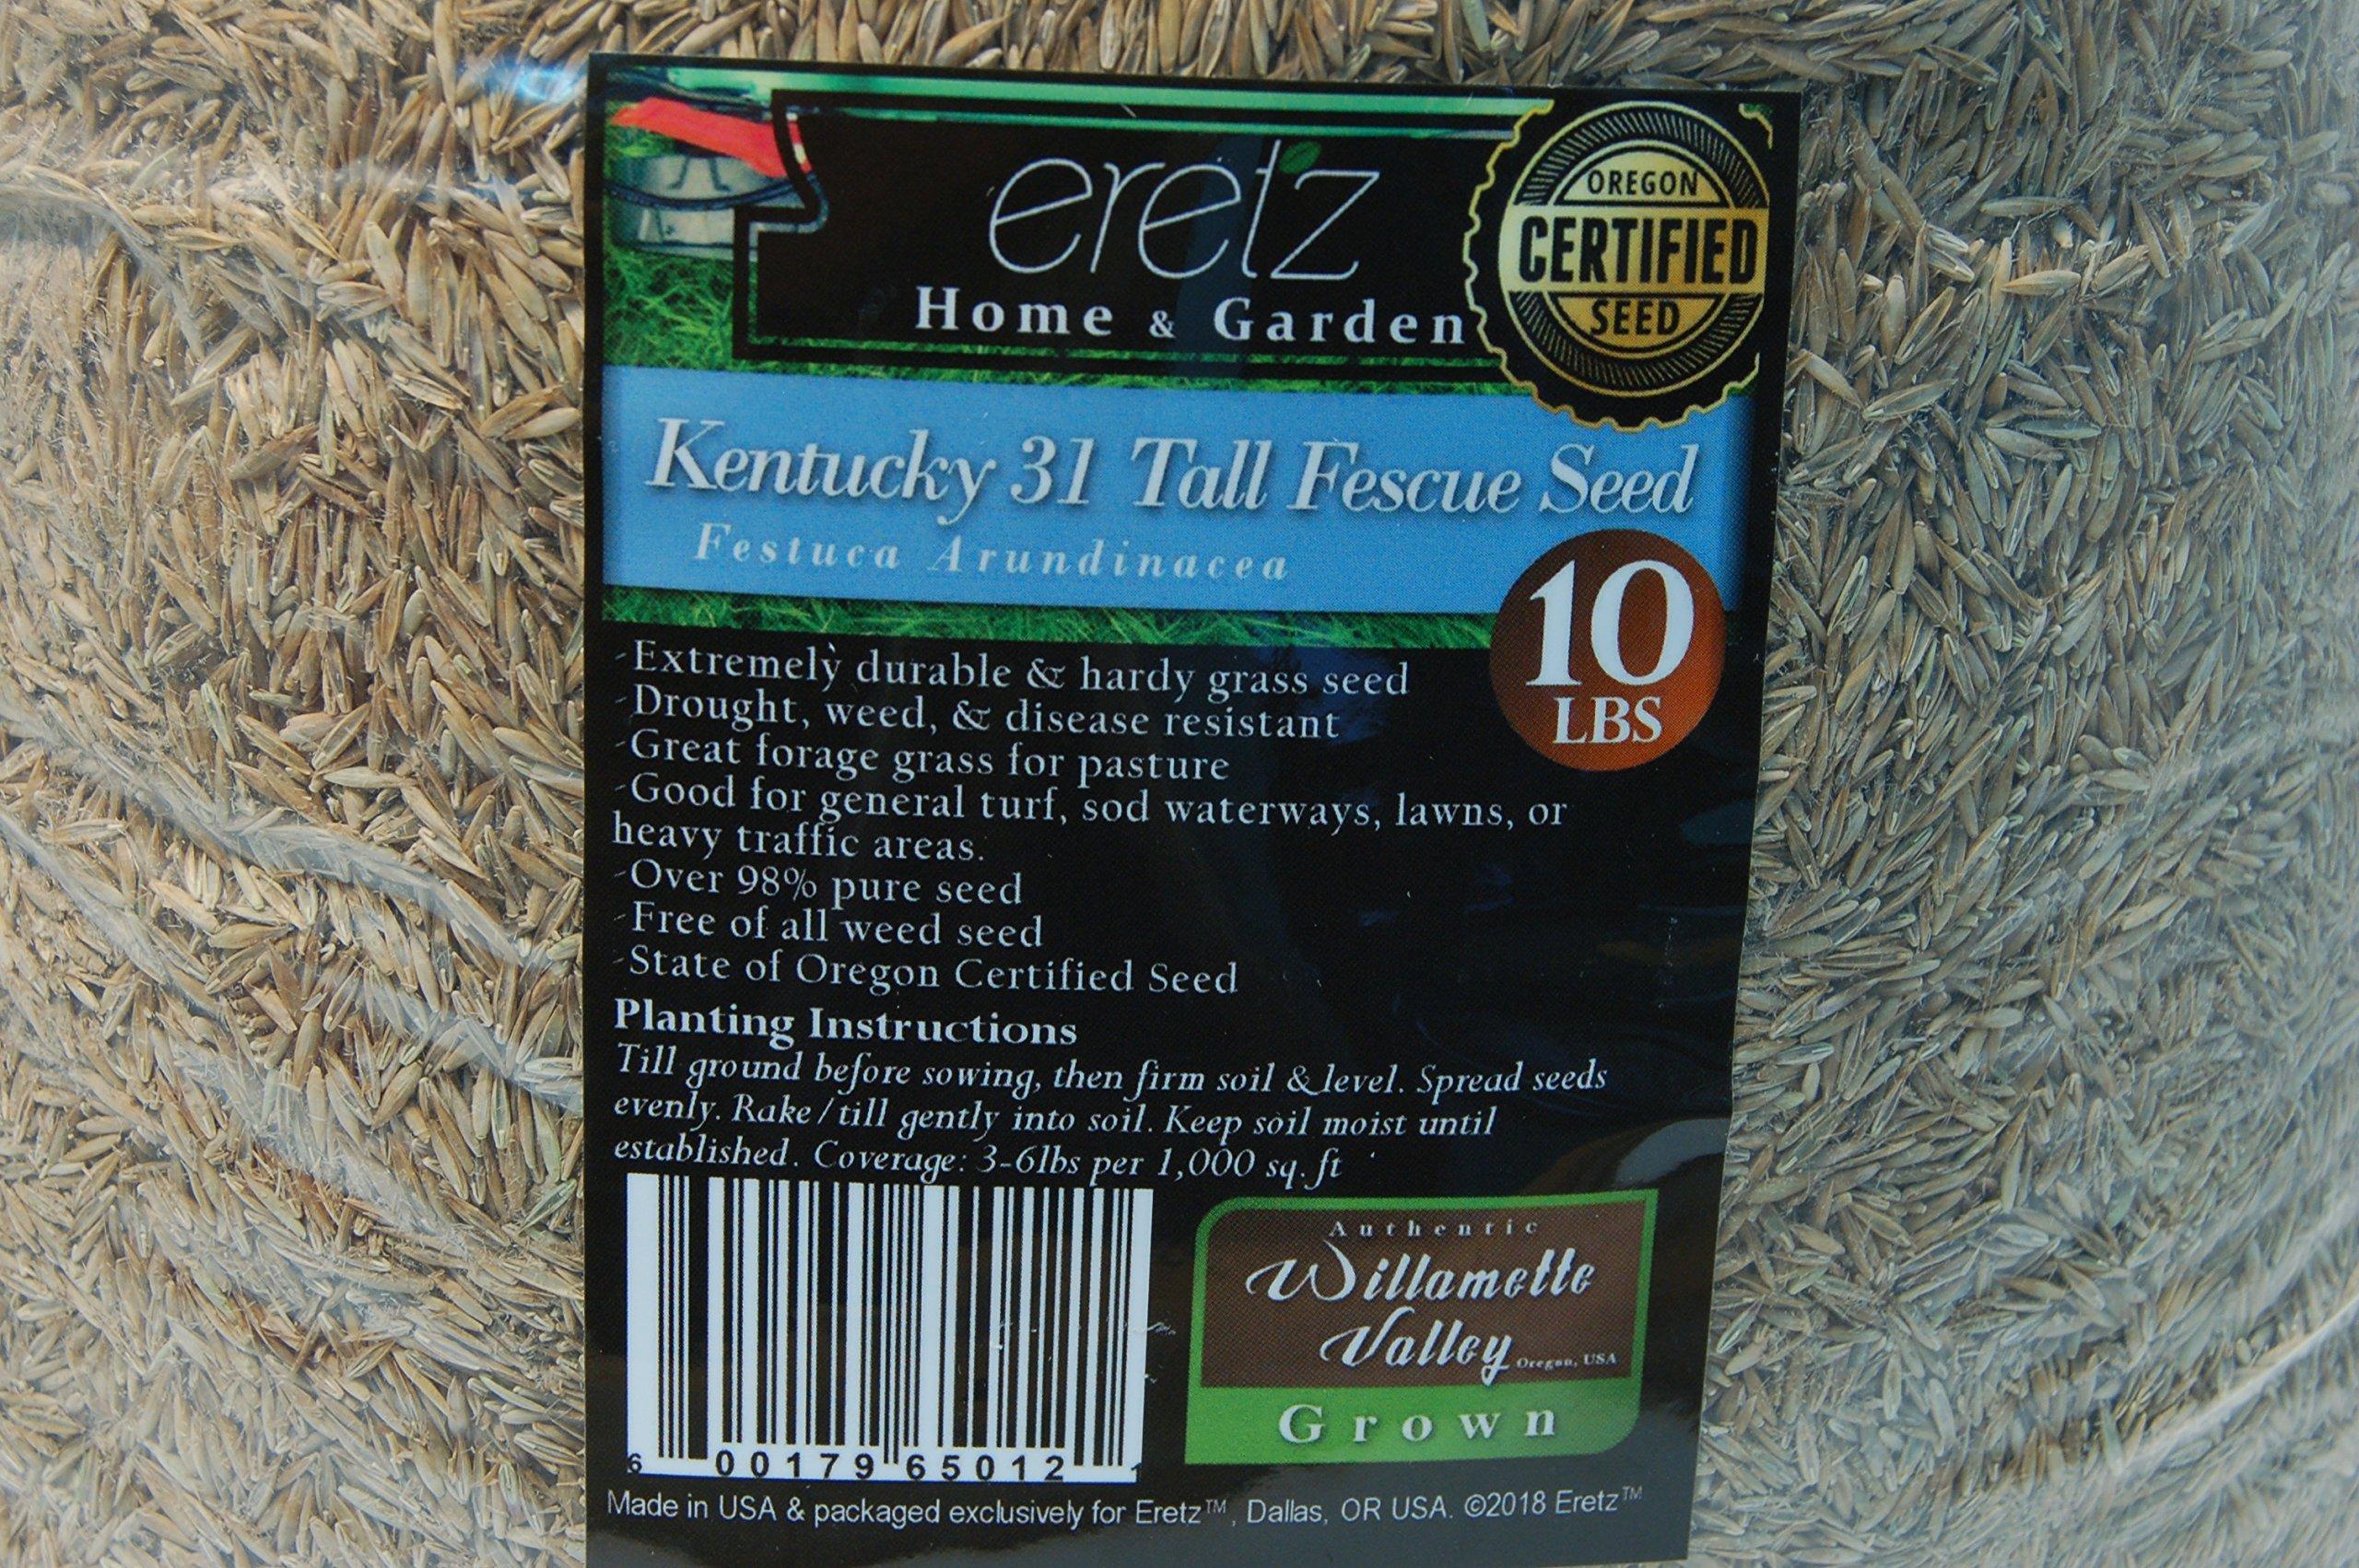 Kentucky 31 Tall Fescue Grass Seed by Eretz - Willamette Valley, Oregon Grown (10lbs) by Eretz